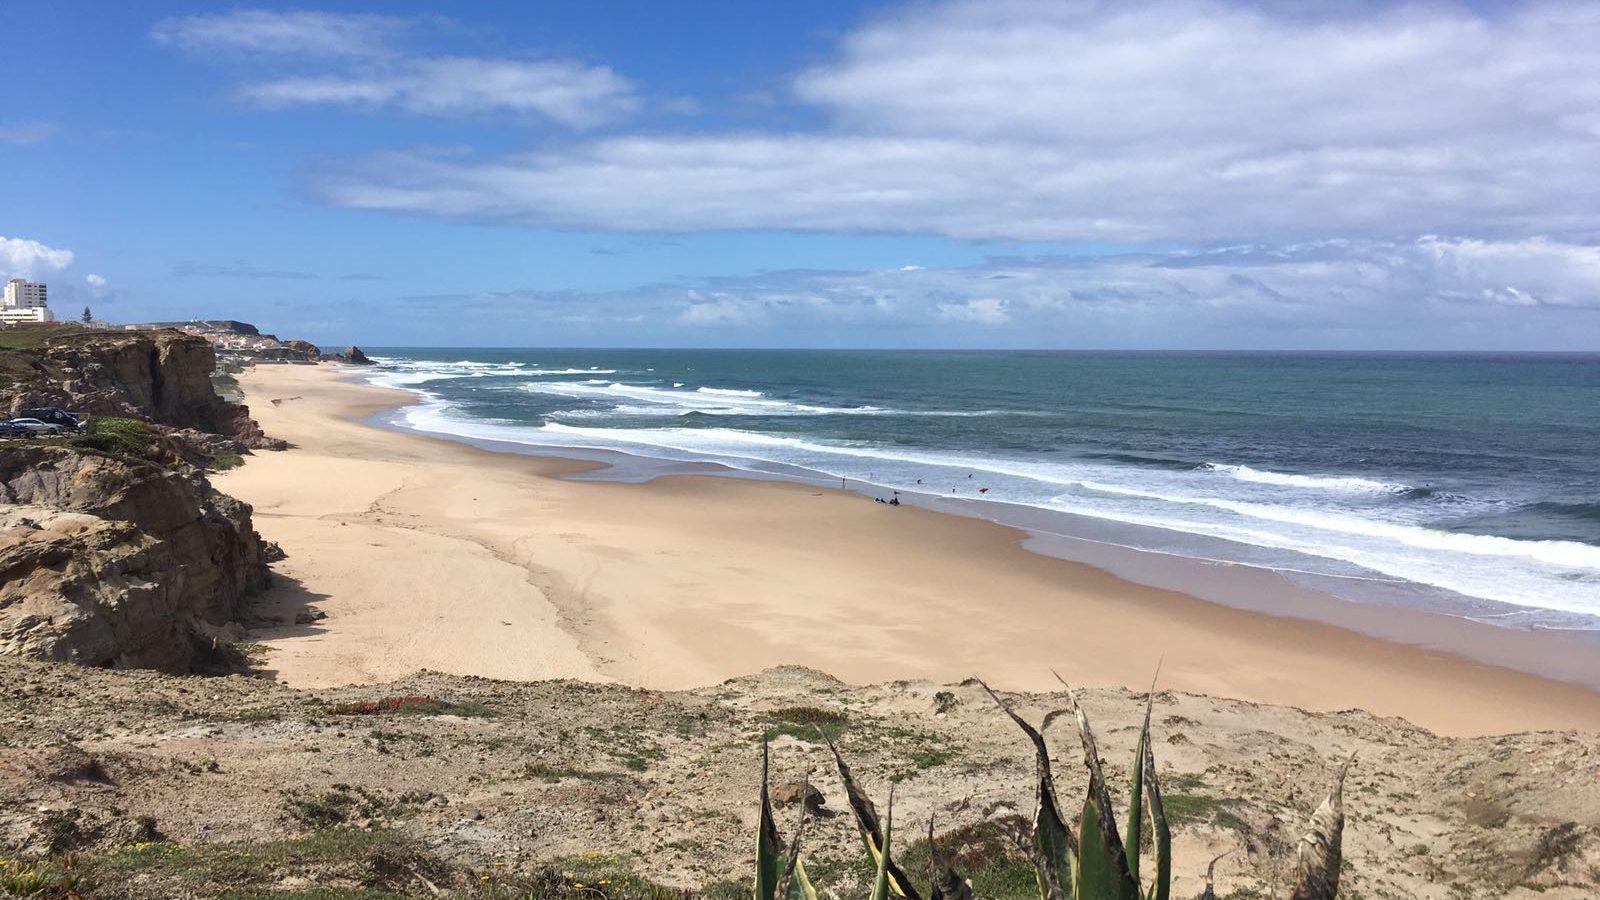 surfing portugal santa cruz surfhouse torres vedras